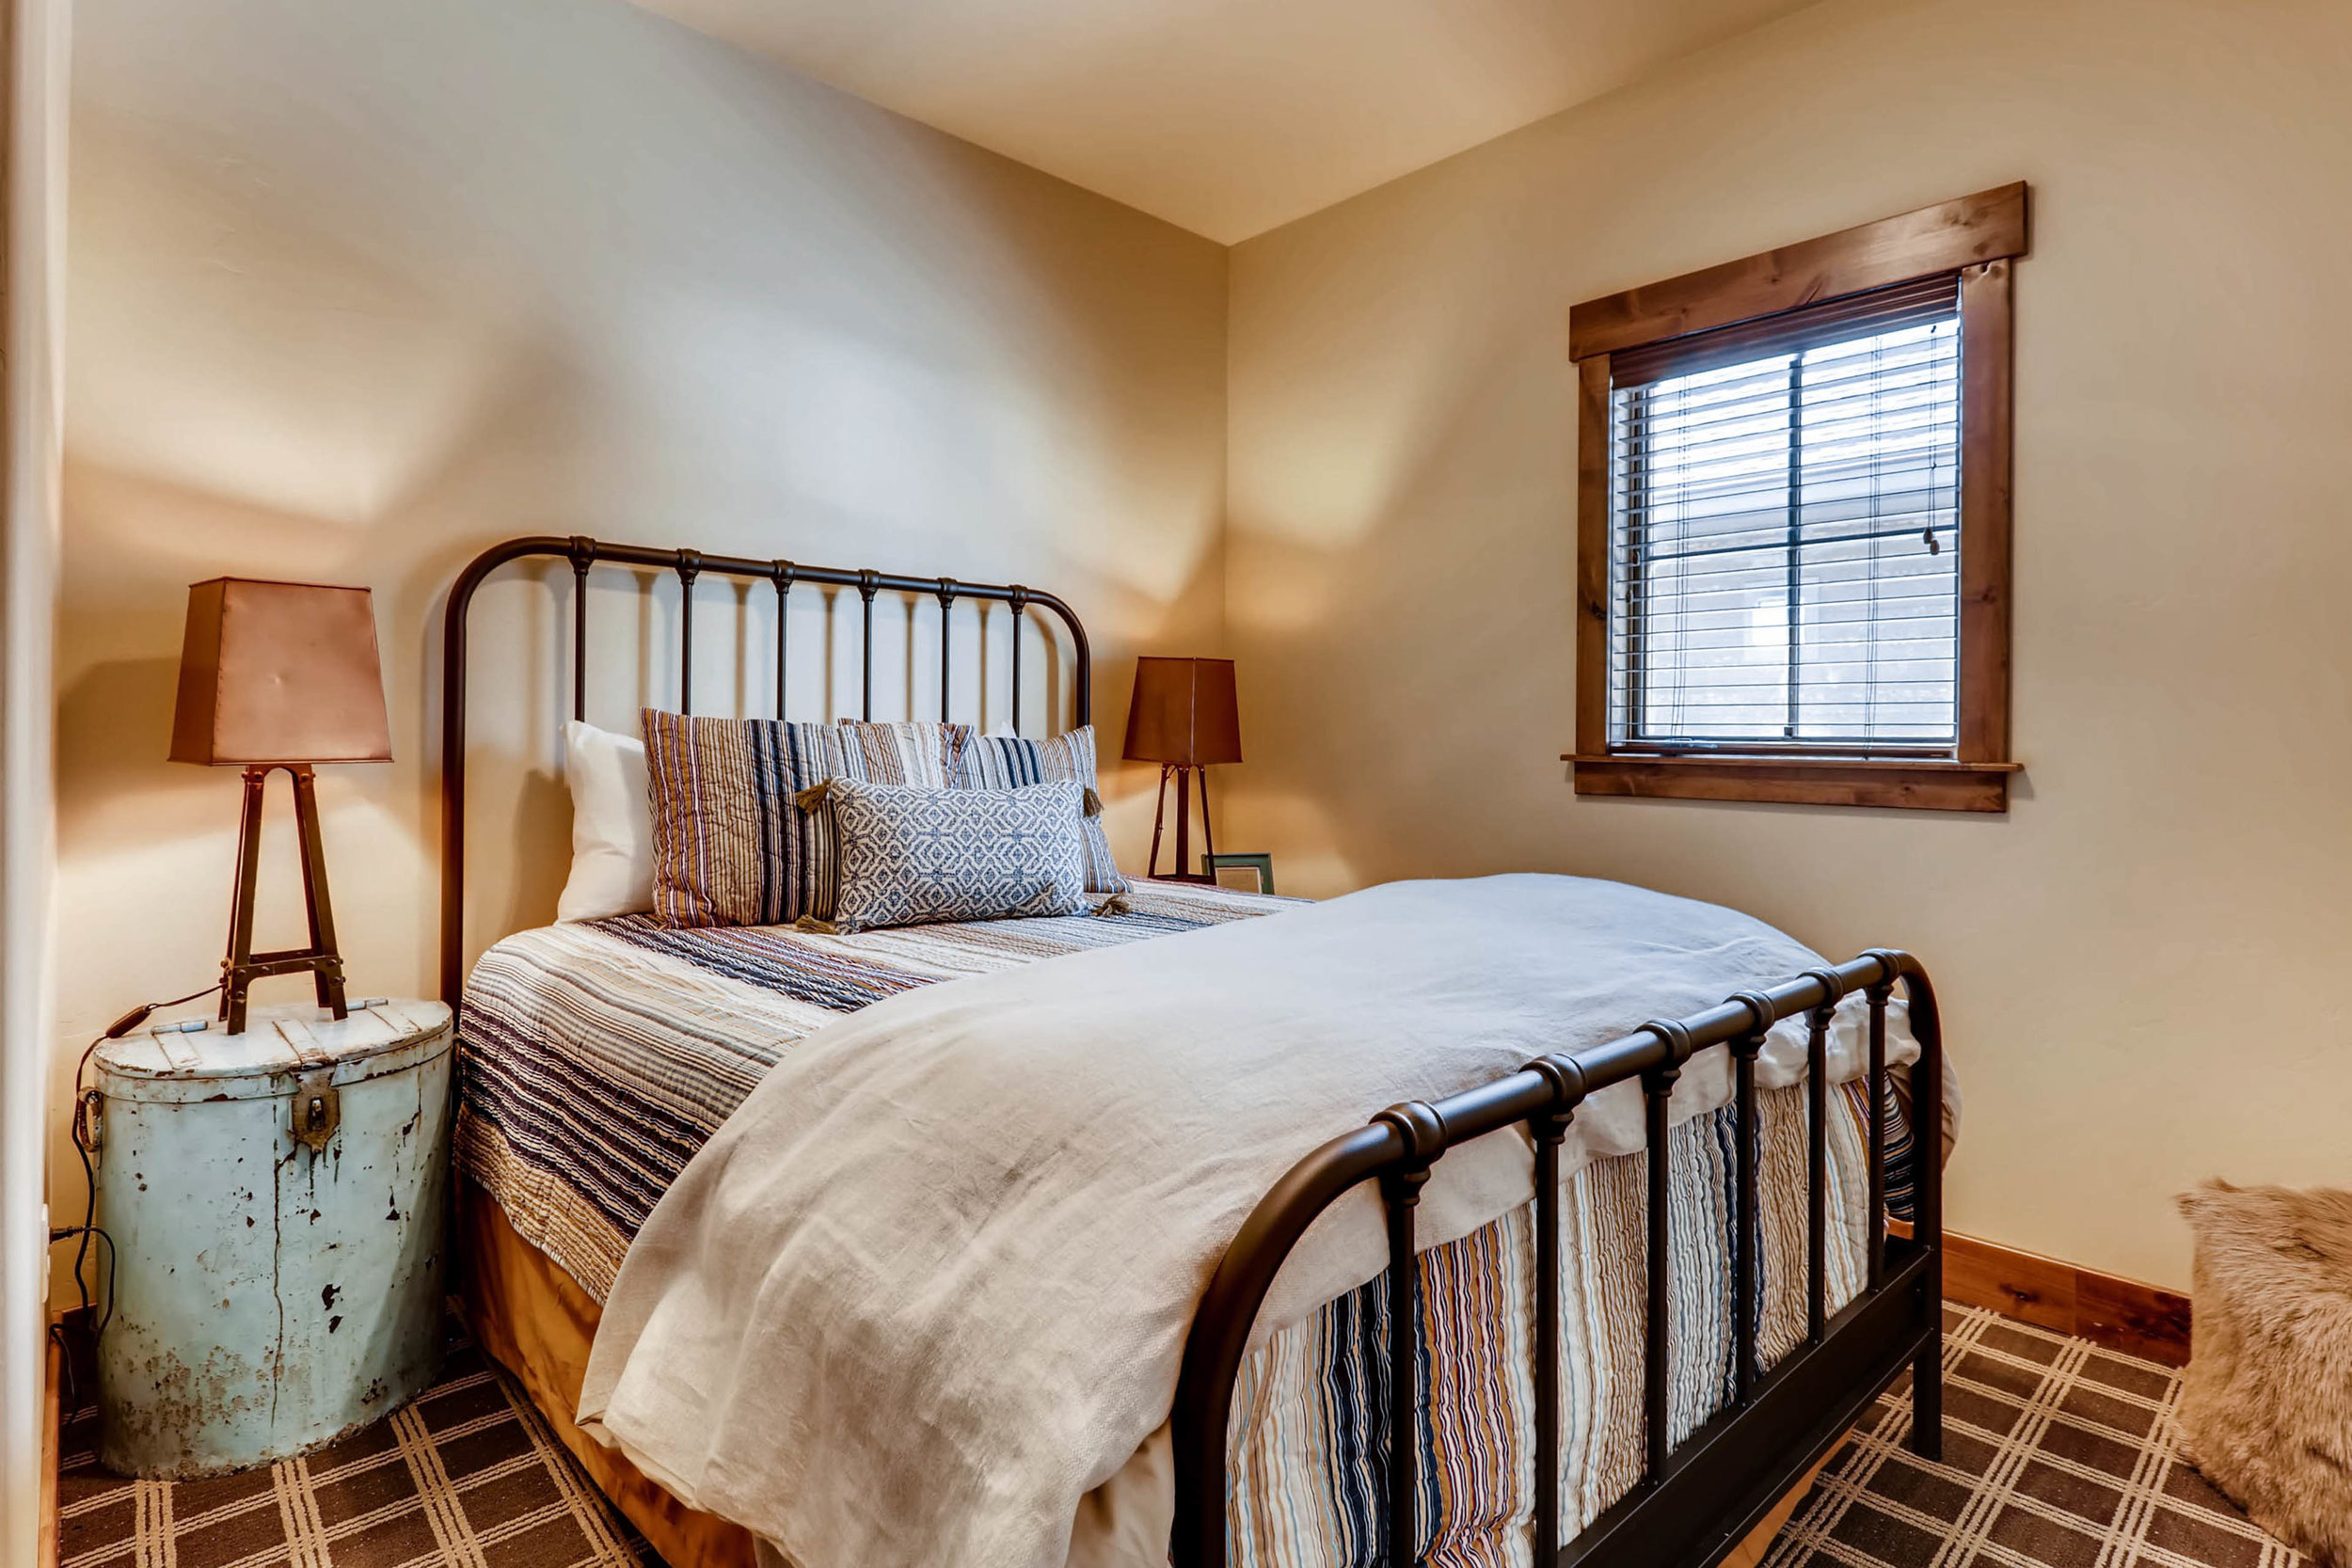 31 Bedroom.jpg